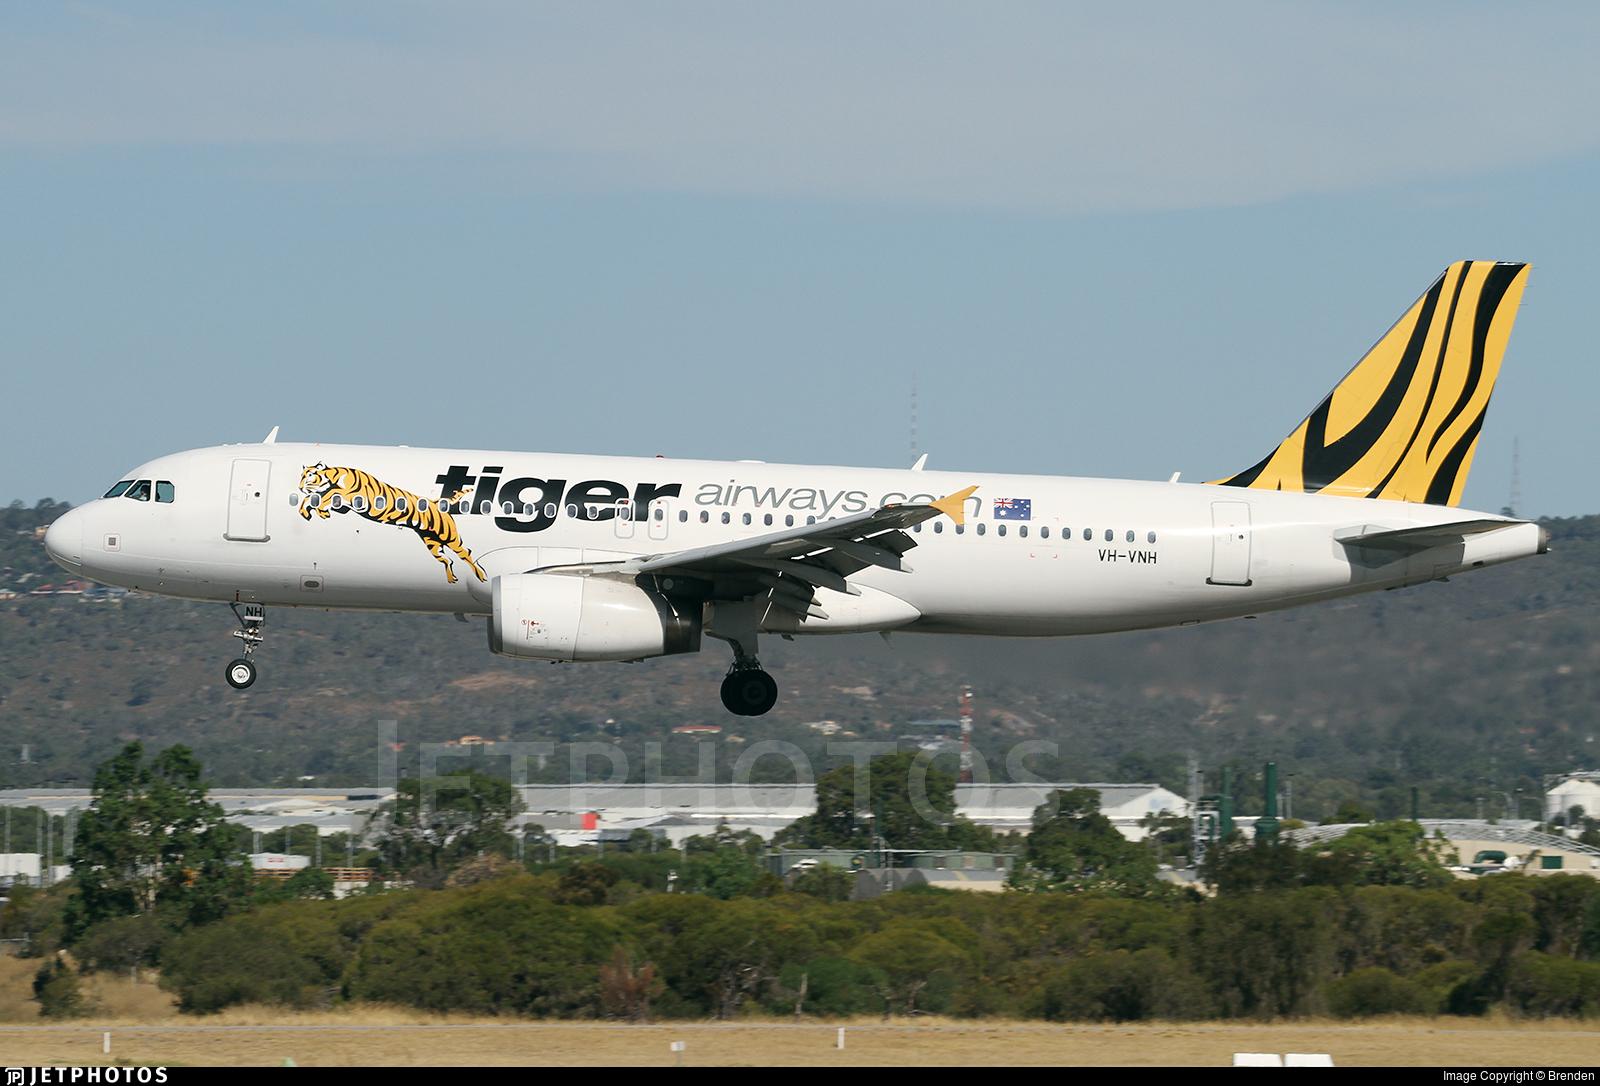 VH-VNH - Airbus A320-232 - Tiger Airways